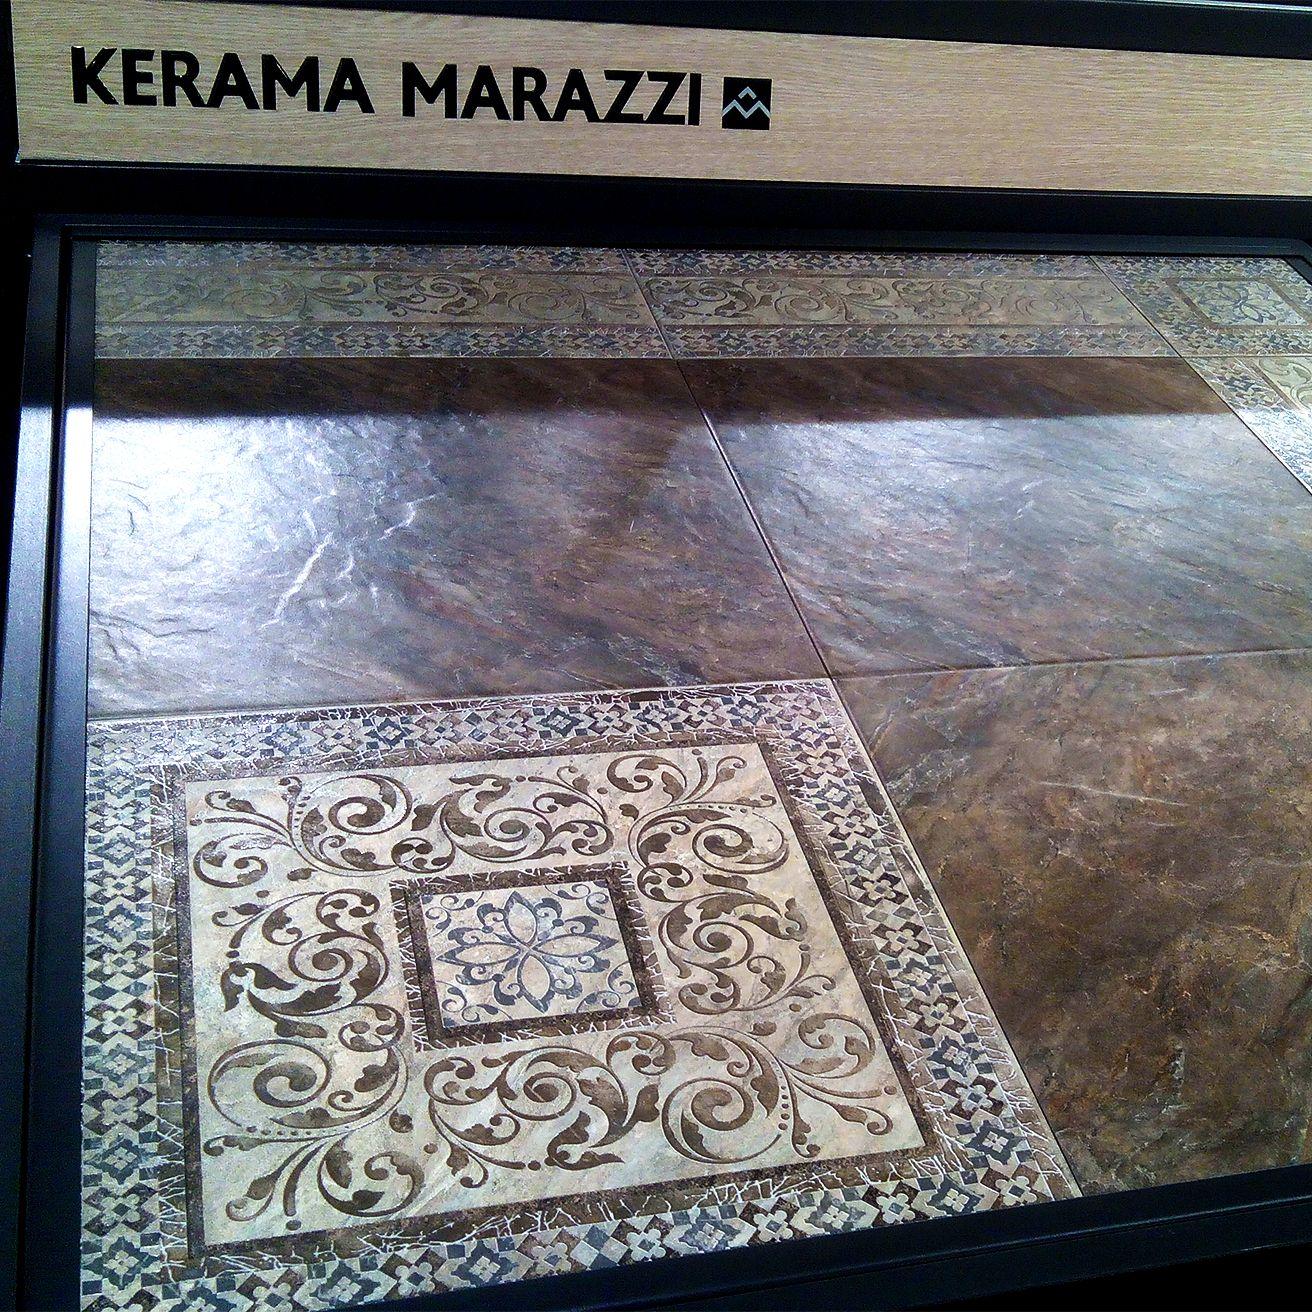 e823b8ae0 Серия керамической плитки «Бромли» из Английской коллекции KERAMA MARAZZI.  #плиткаподмосковья #keramamarazzi #керамамарацци #керамическаяплитка ...